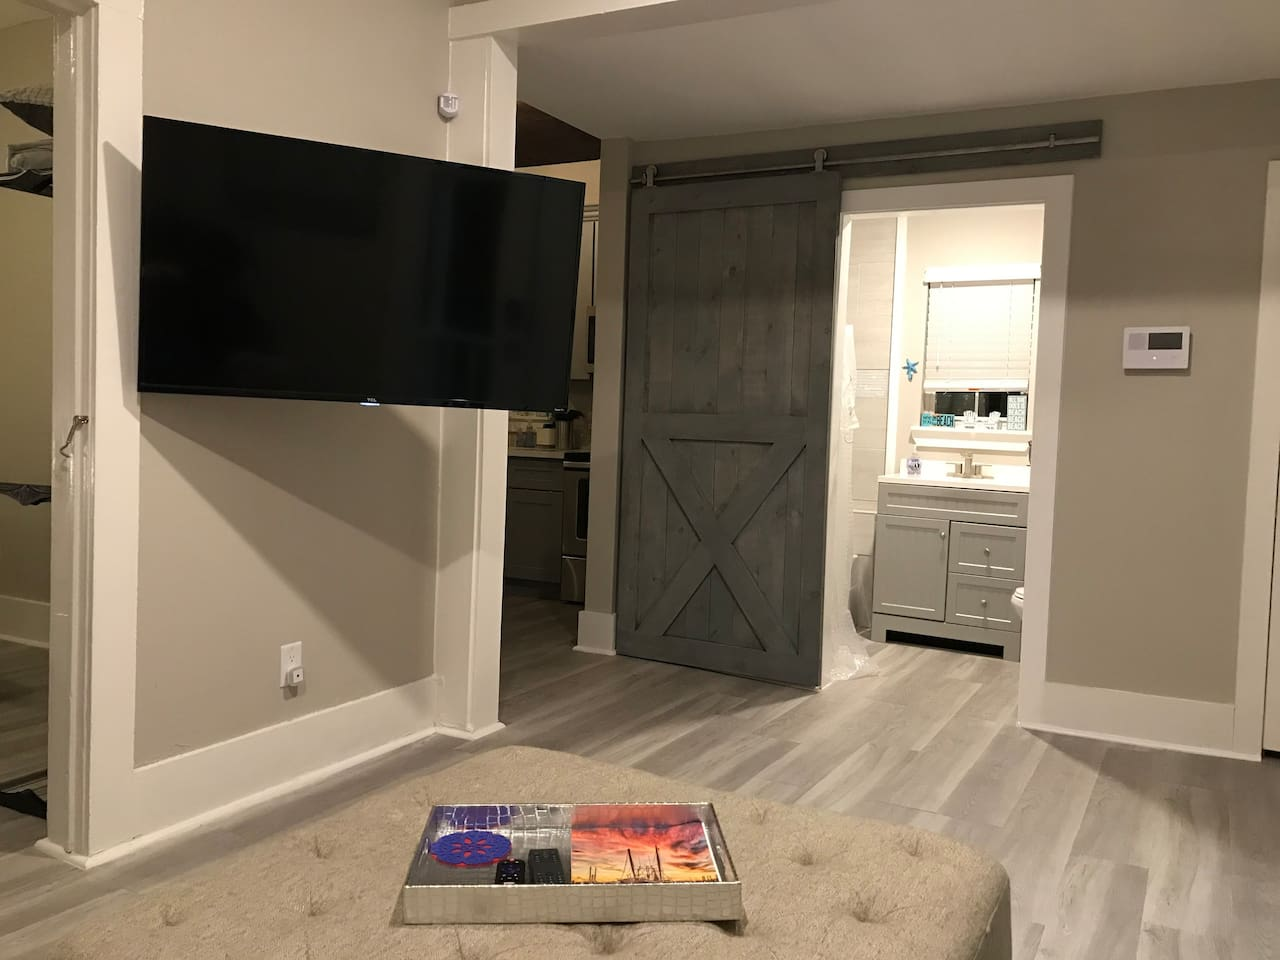 Airbnb-Galveston, Texas